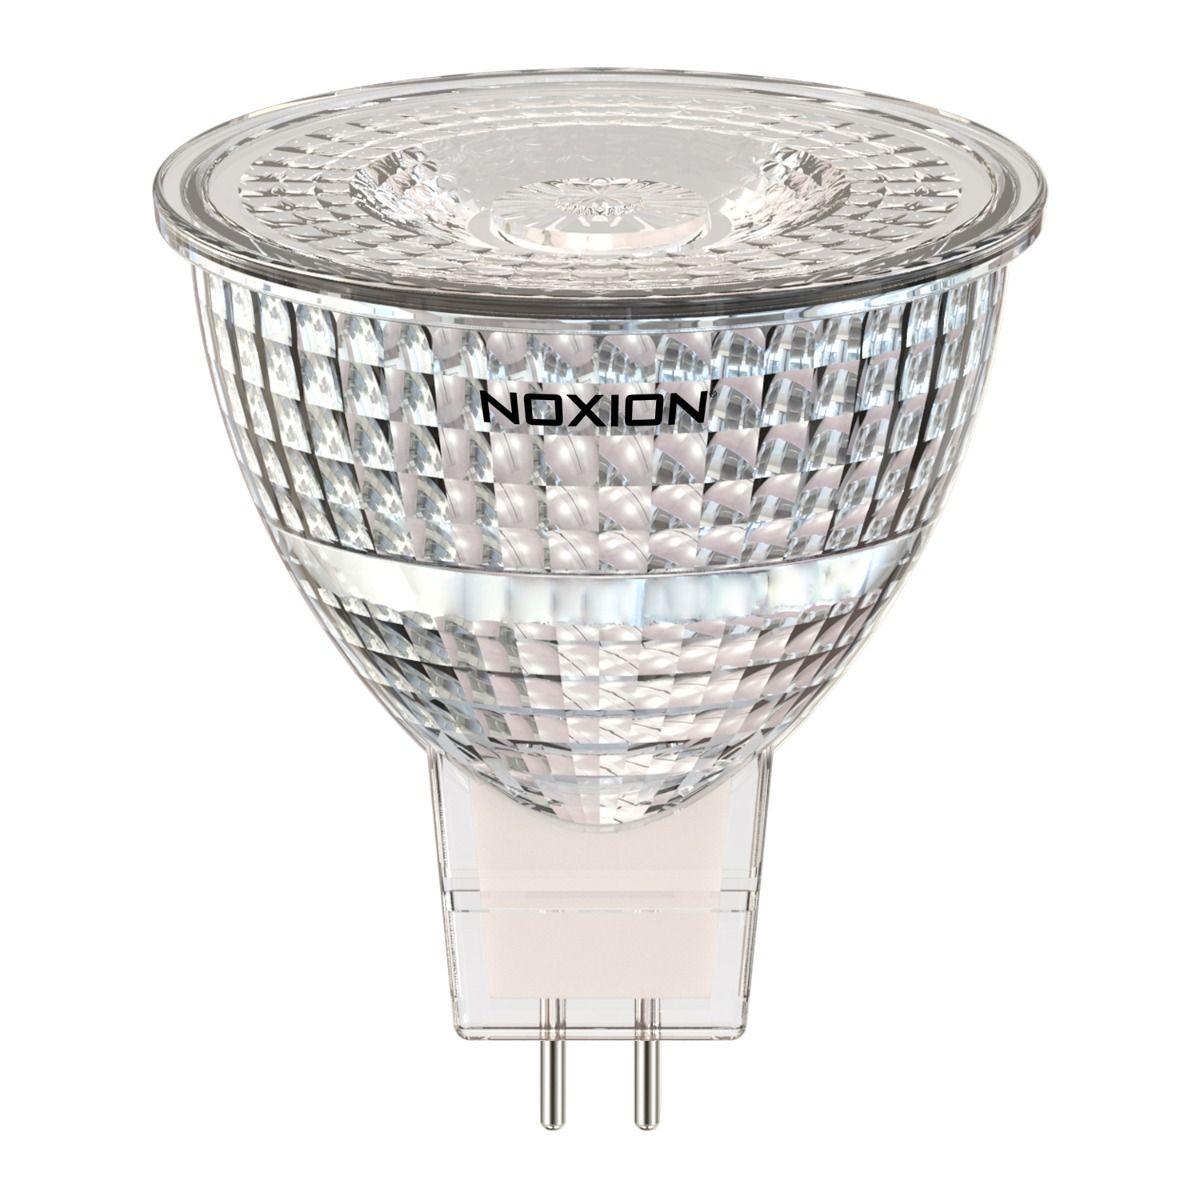 Noxion LED Spot GU5.3 7.8W 830 36D 730lm | Vervanger voor 50W